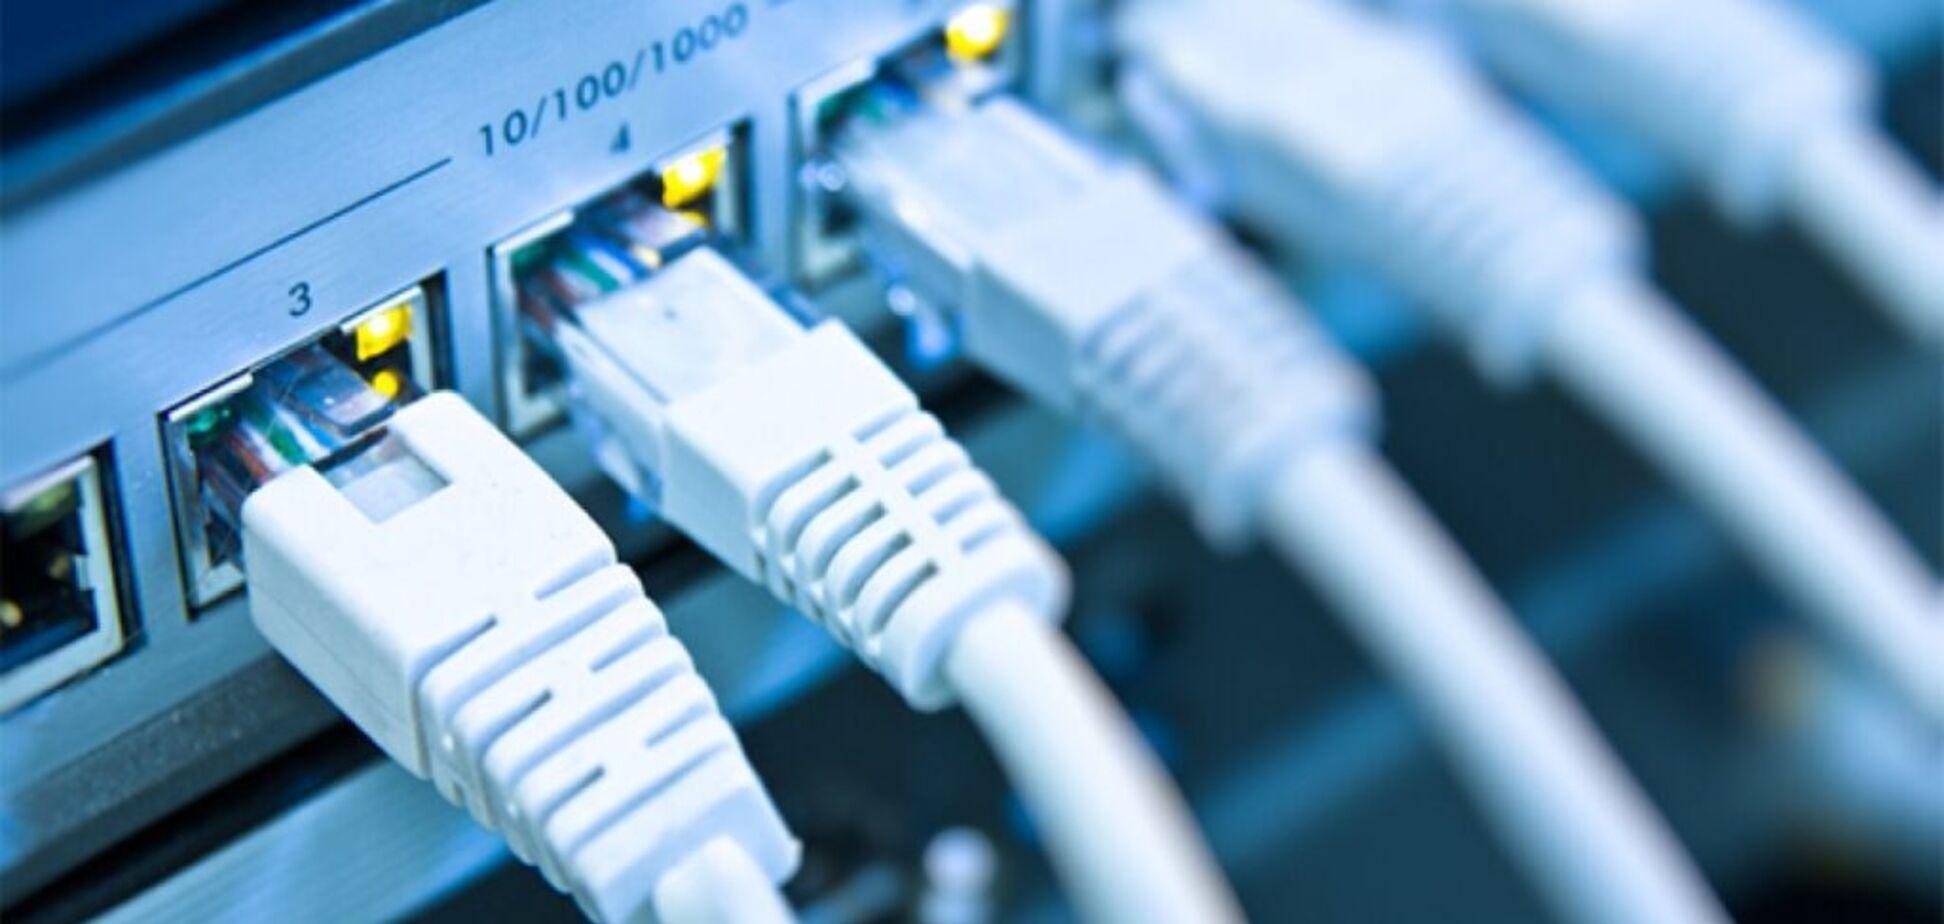 На Черниговщине реализован ряд проектов по программе 'Интернет-субвенция'